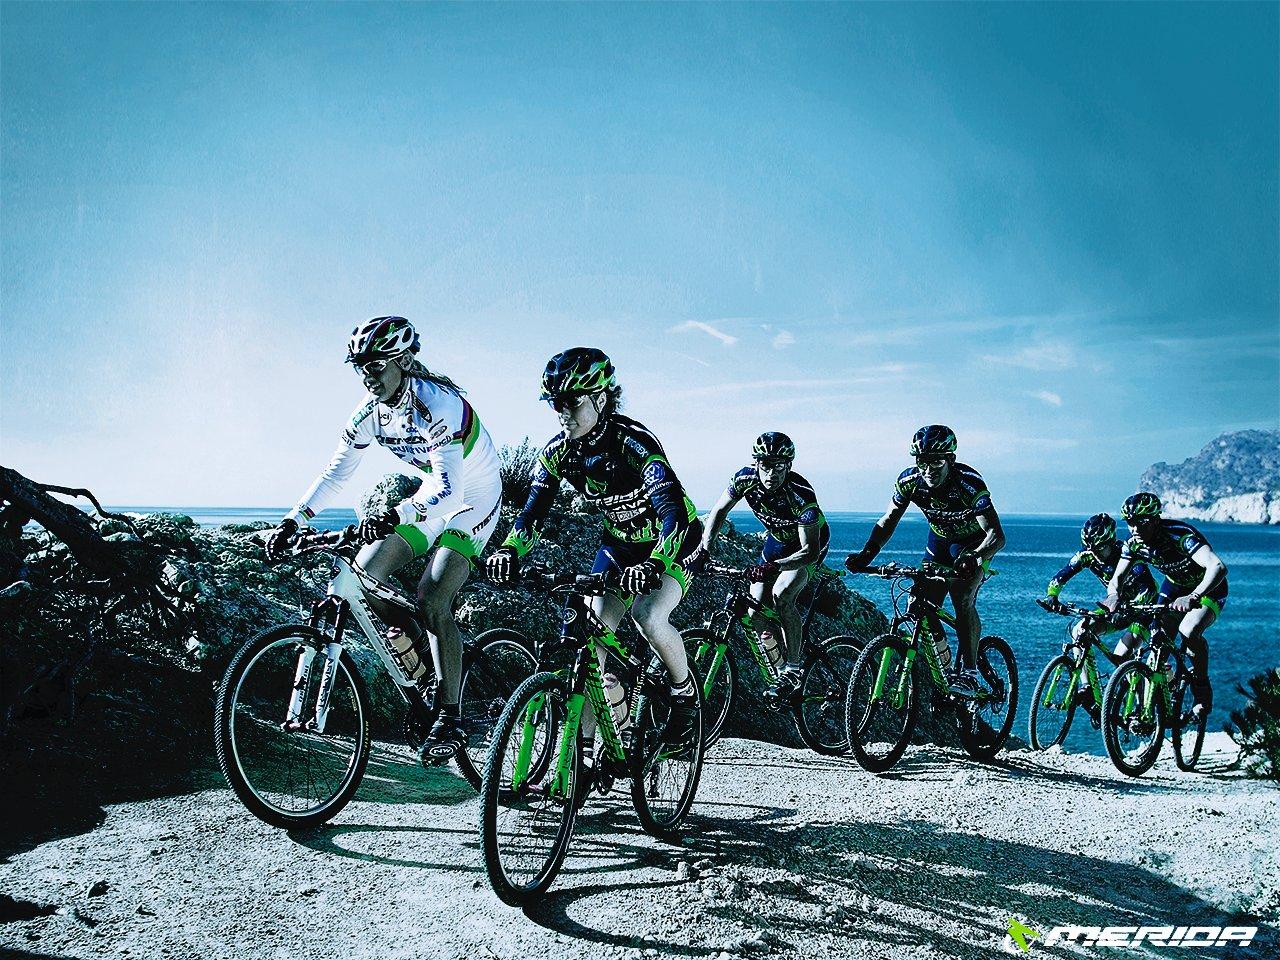 Bike Girl Iphone Wallpaper Papel De Parede Grupo De Mountain Bike Wallpaper Para